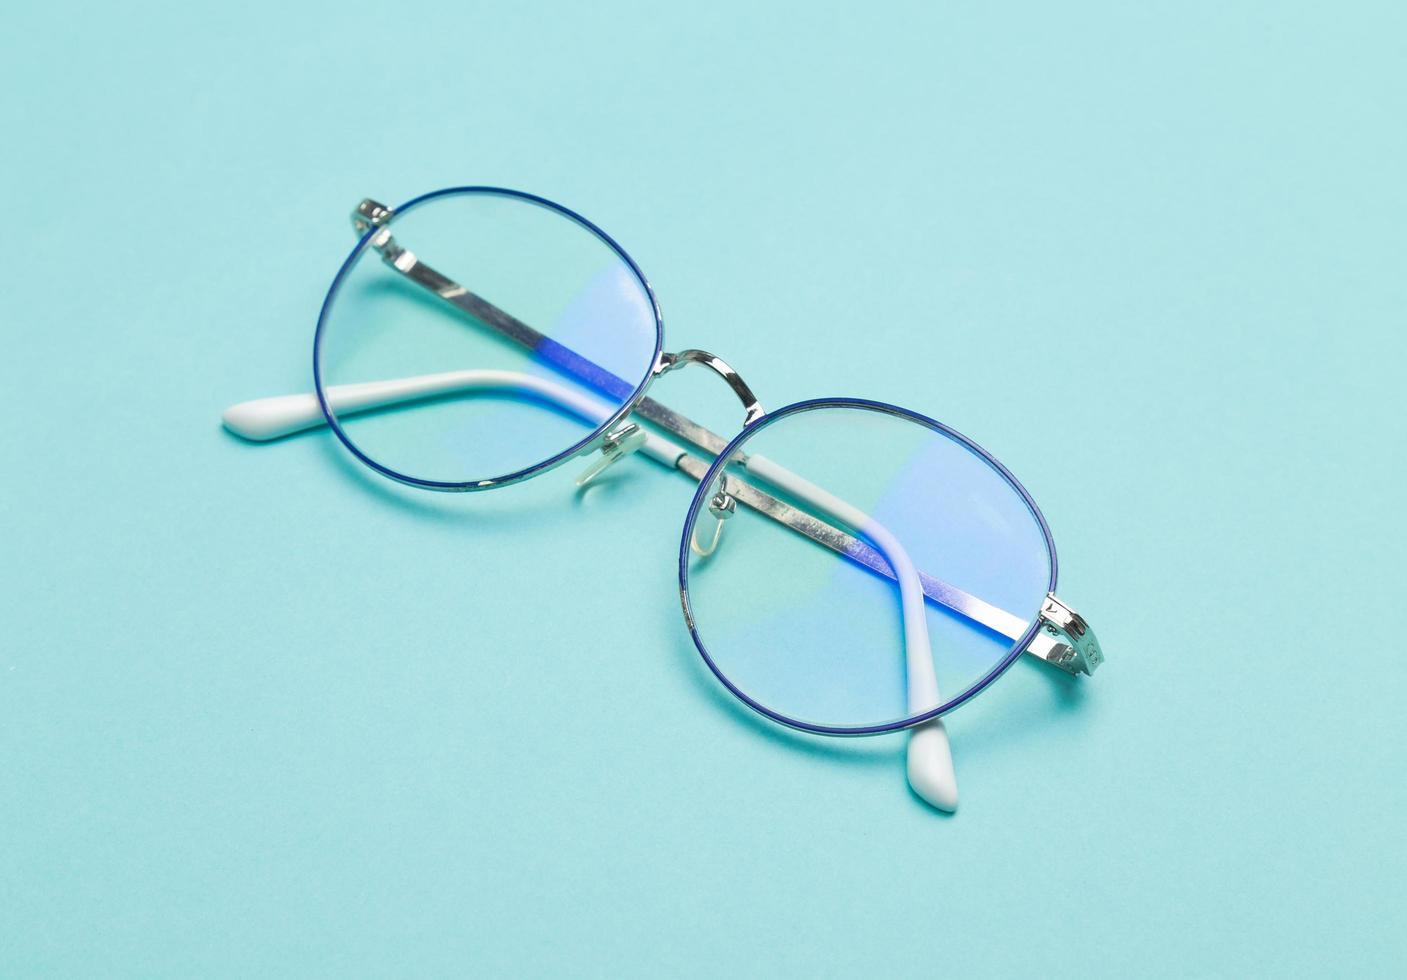 occhiali da vista su sfondo blu foto